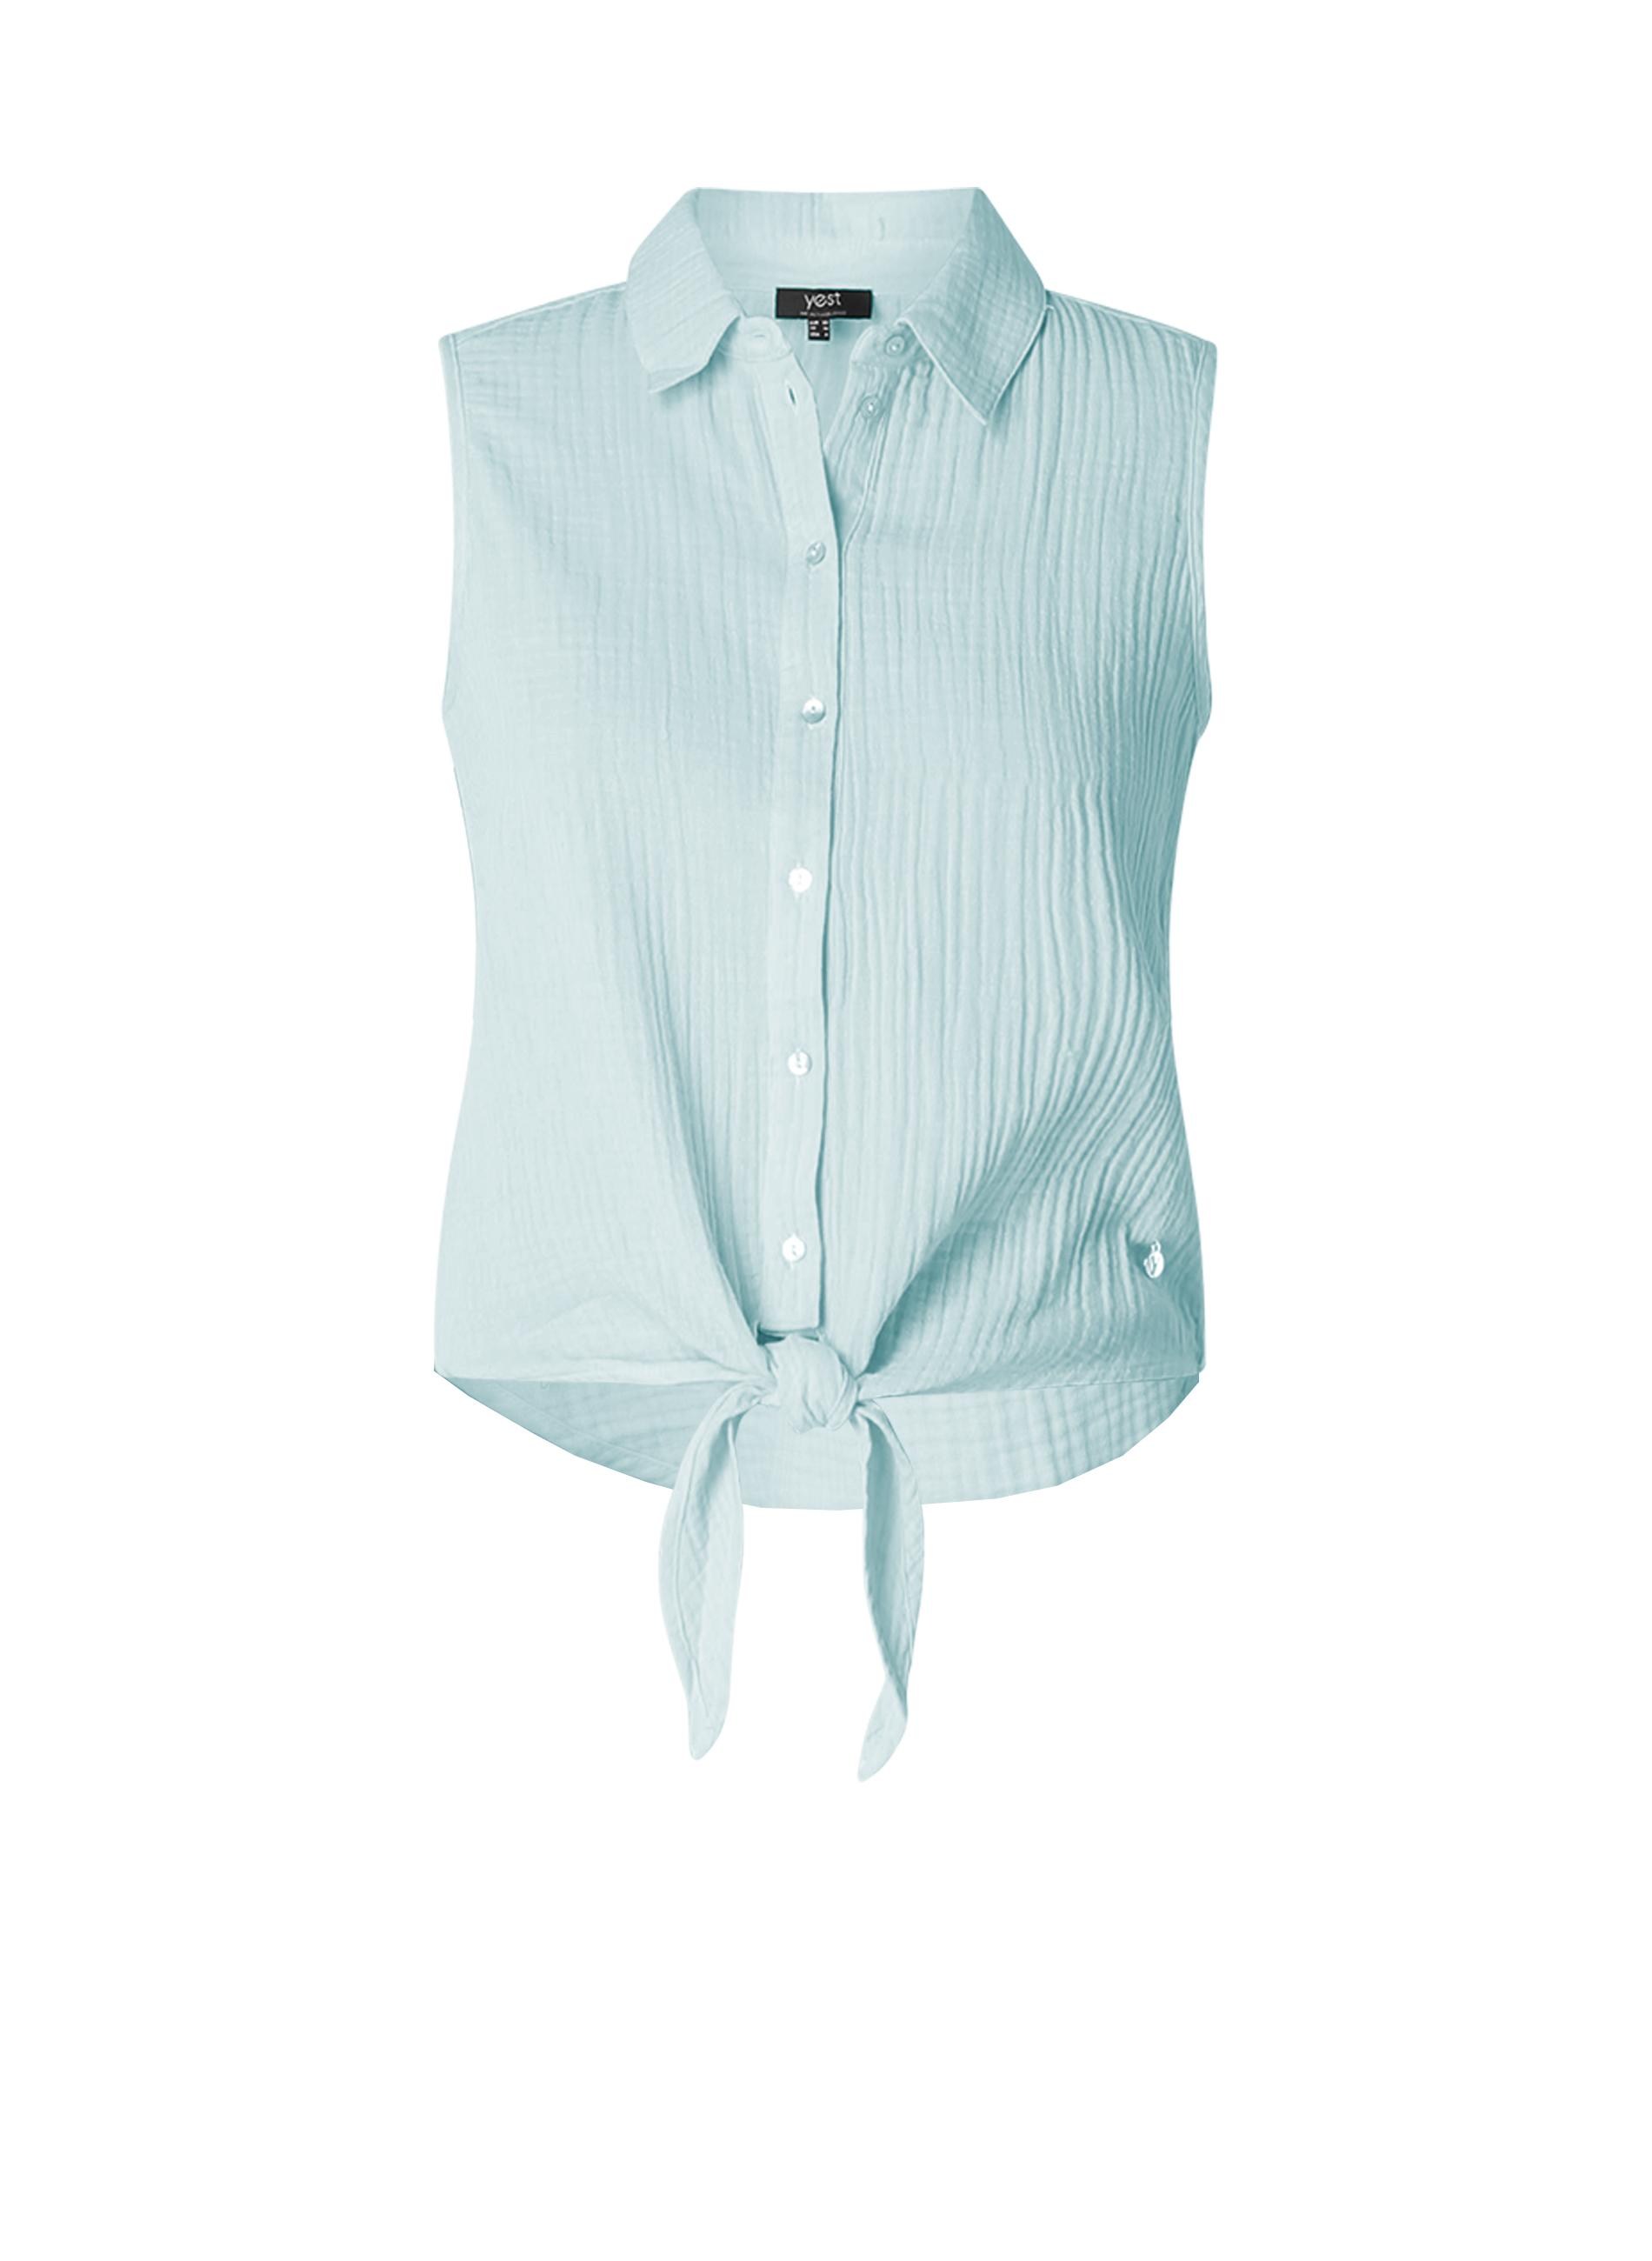 Yesta shirt Laela 76 cm